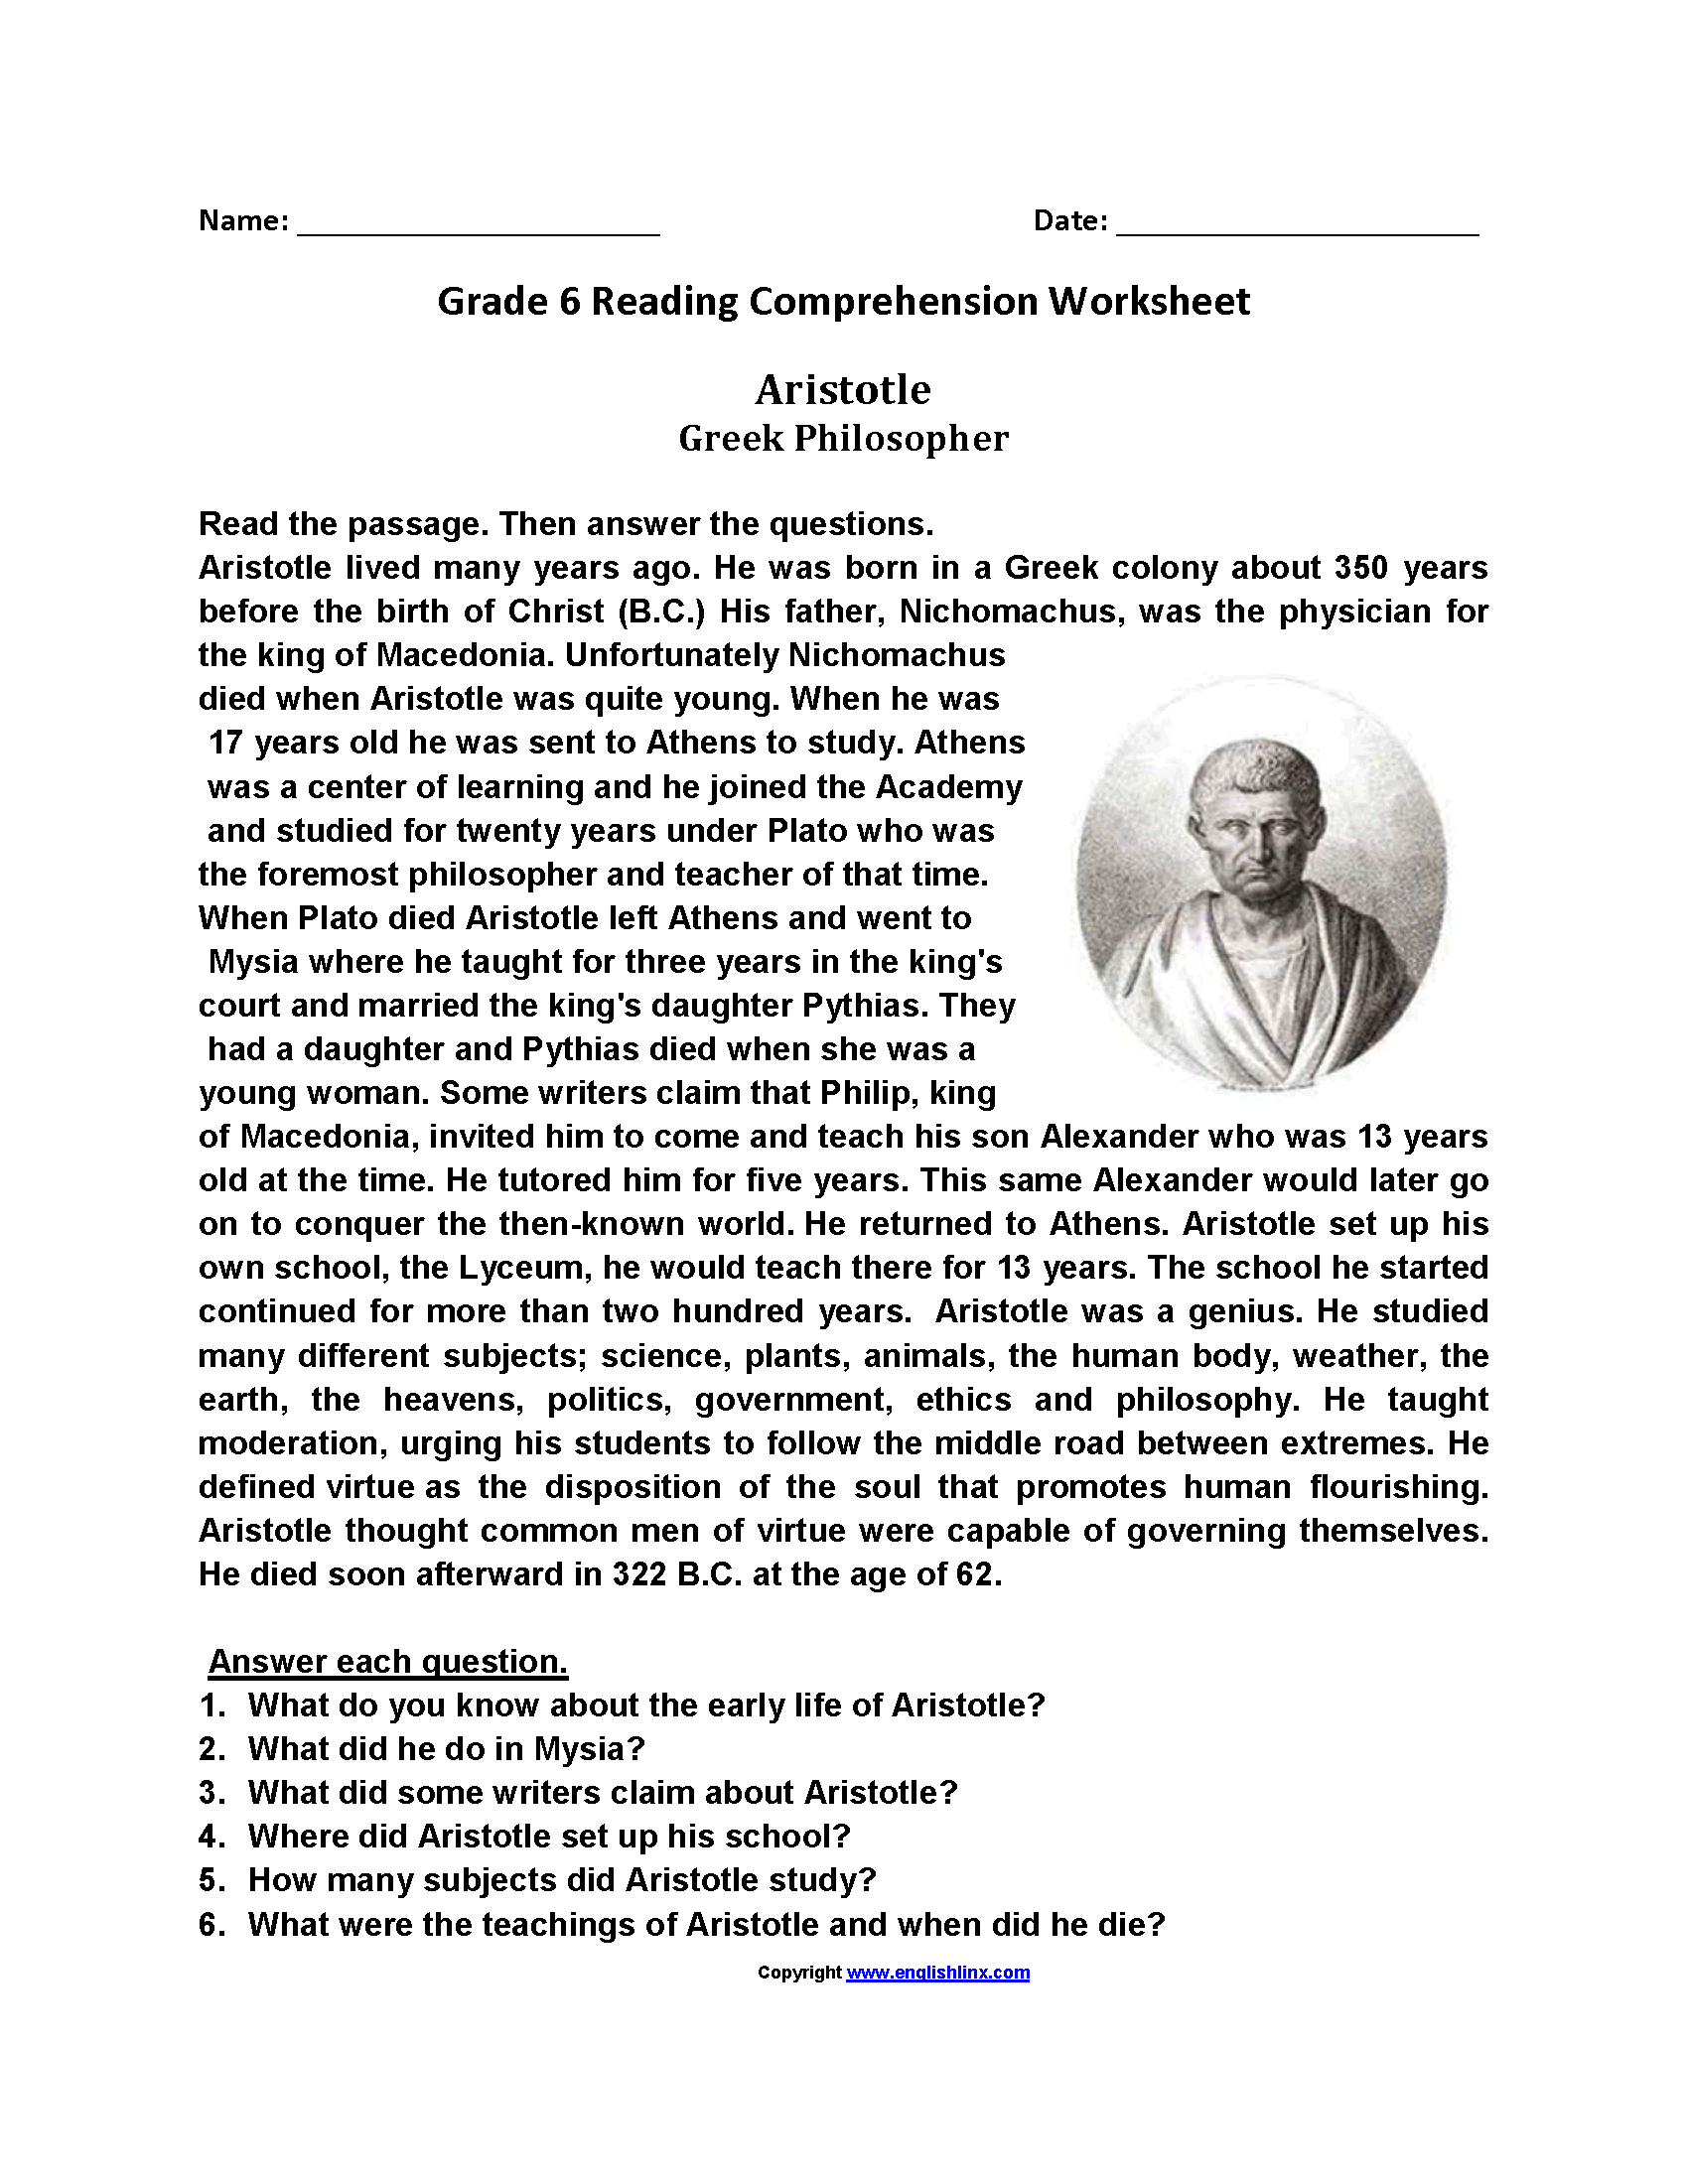 medium resolution of Reading comprehension passages grade 6 pdf   thaimacom   Reading  comprehension worksheets